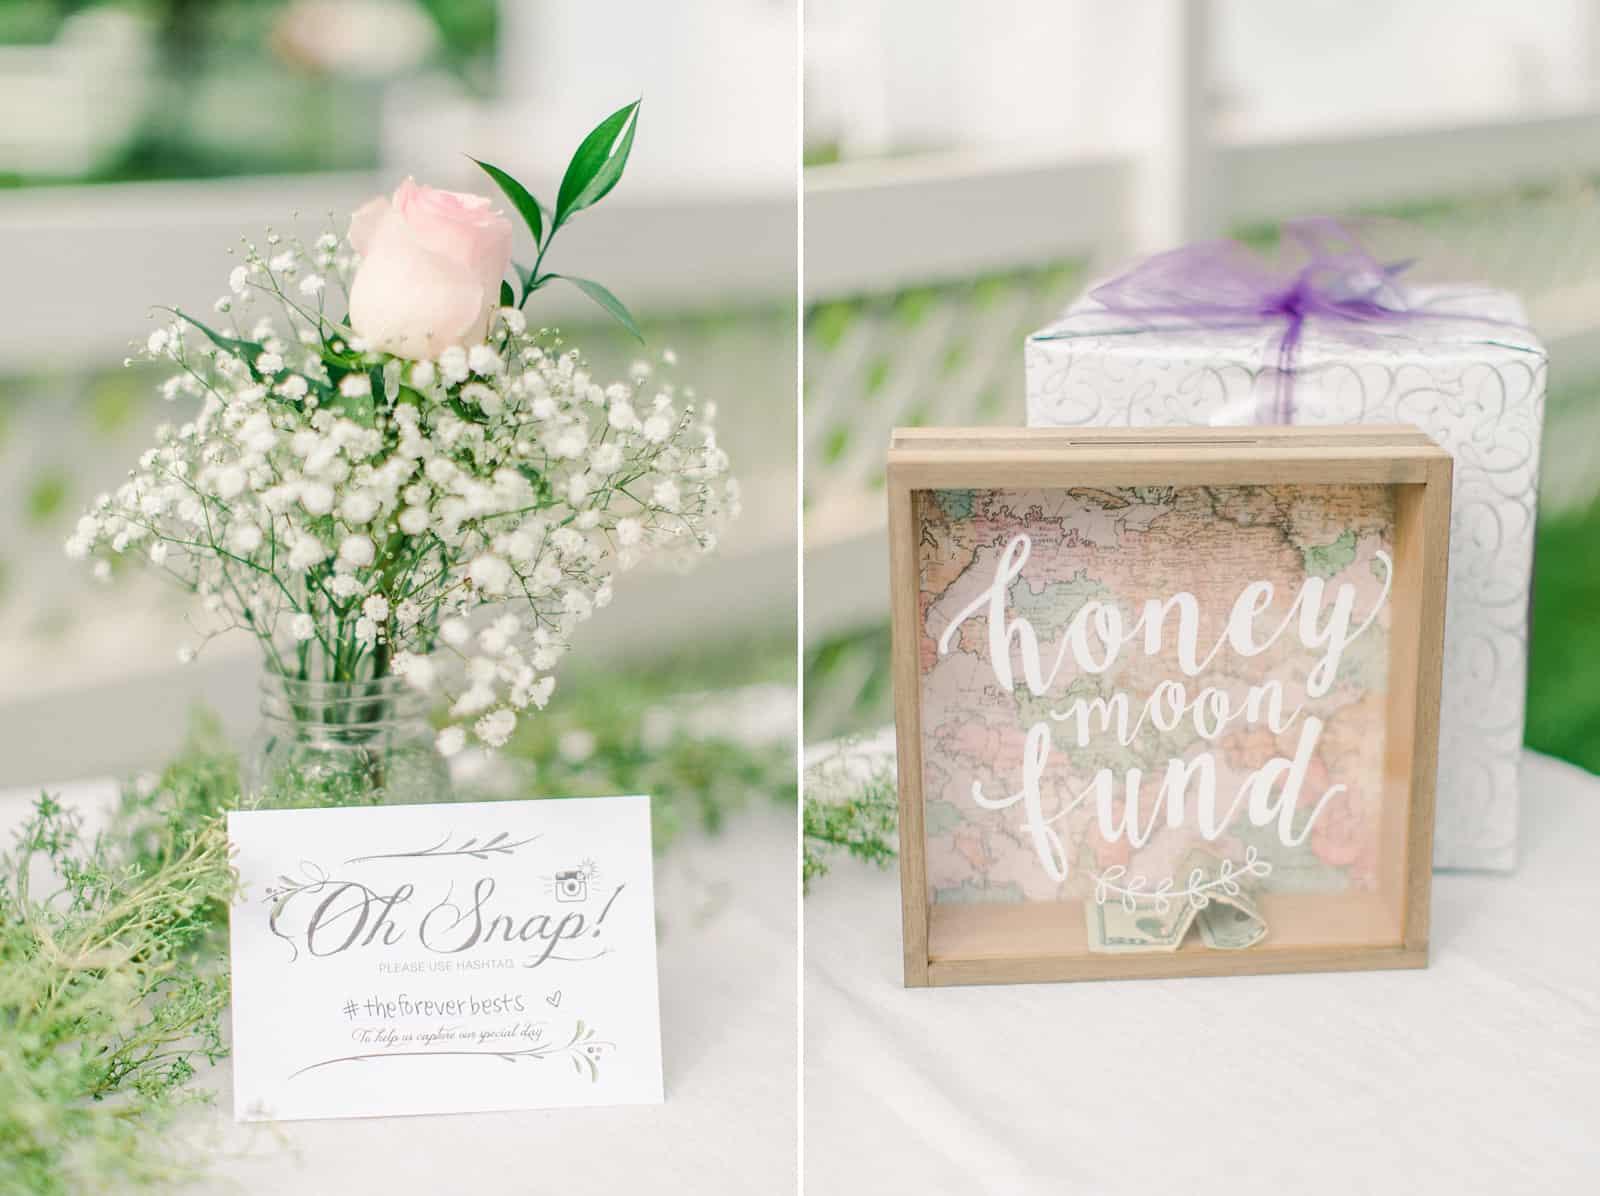 Draper LDS Temple Wedding, Utah wedding photography, summer backyard wedding, reception decor calligraphy sign, honeymoon fund